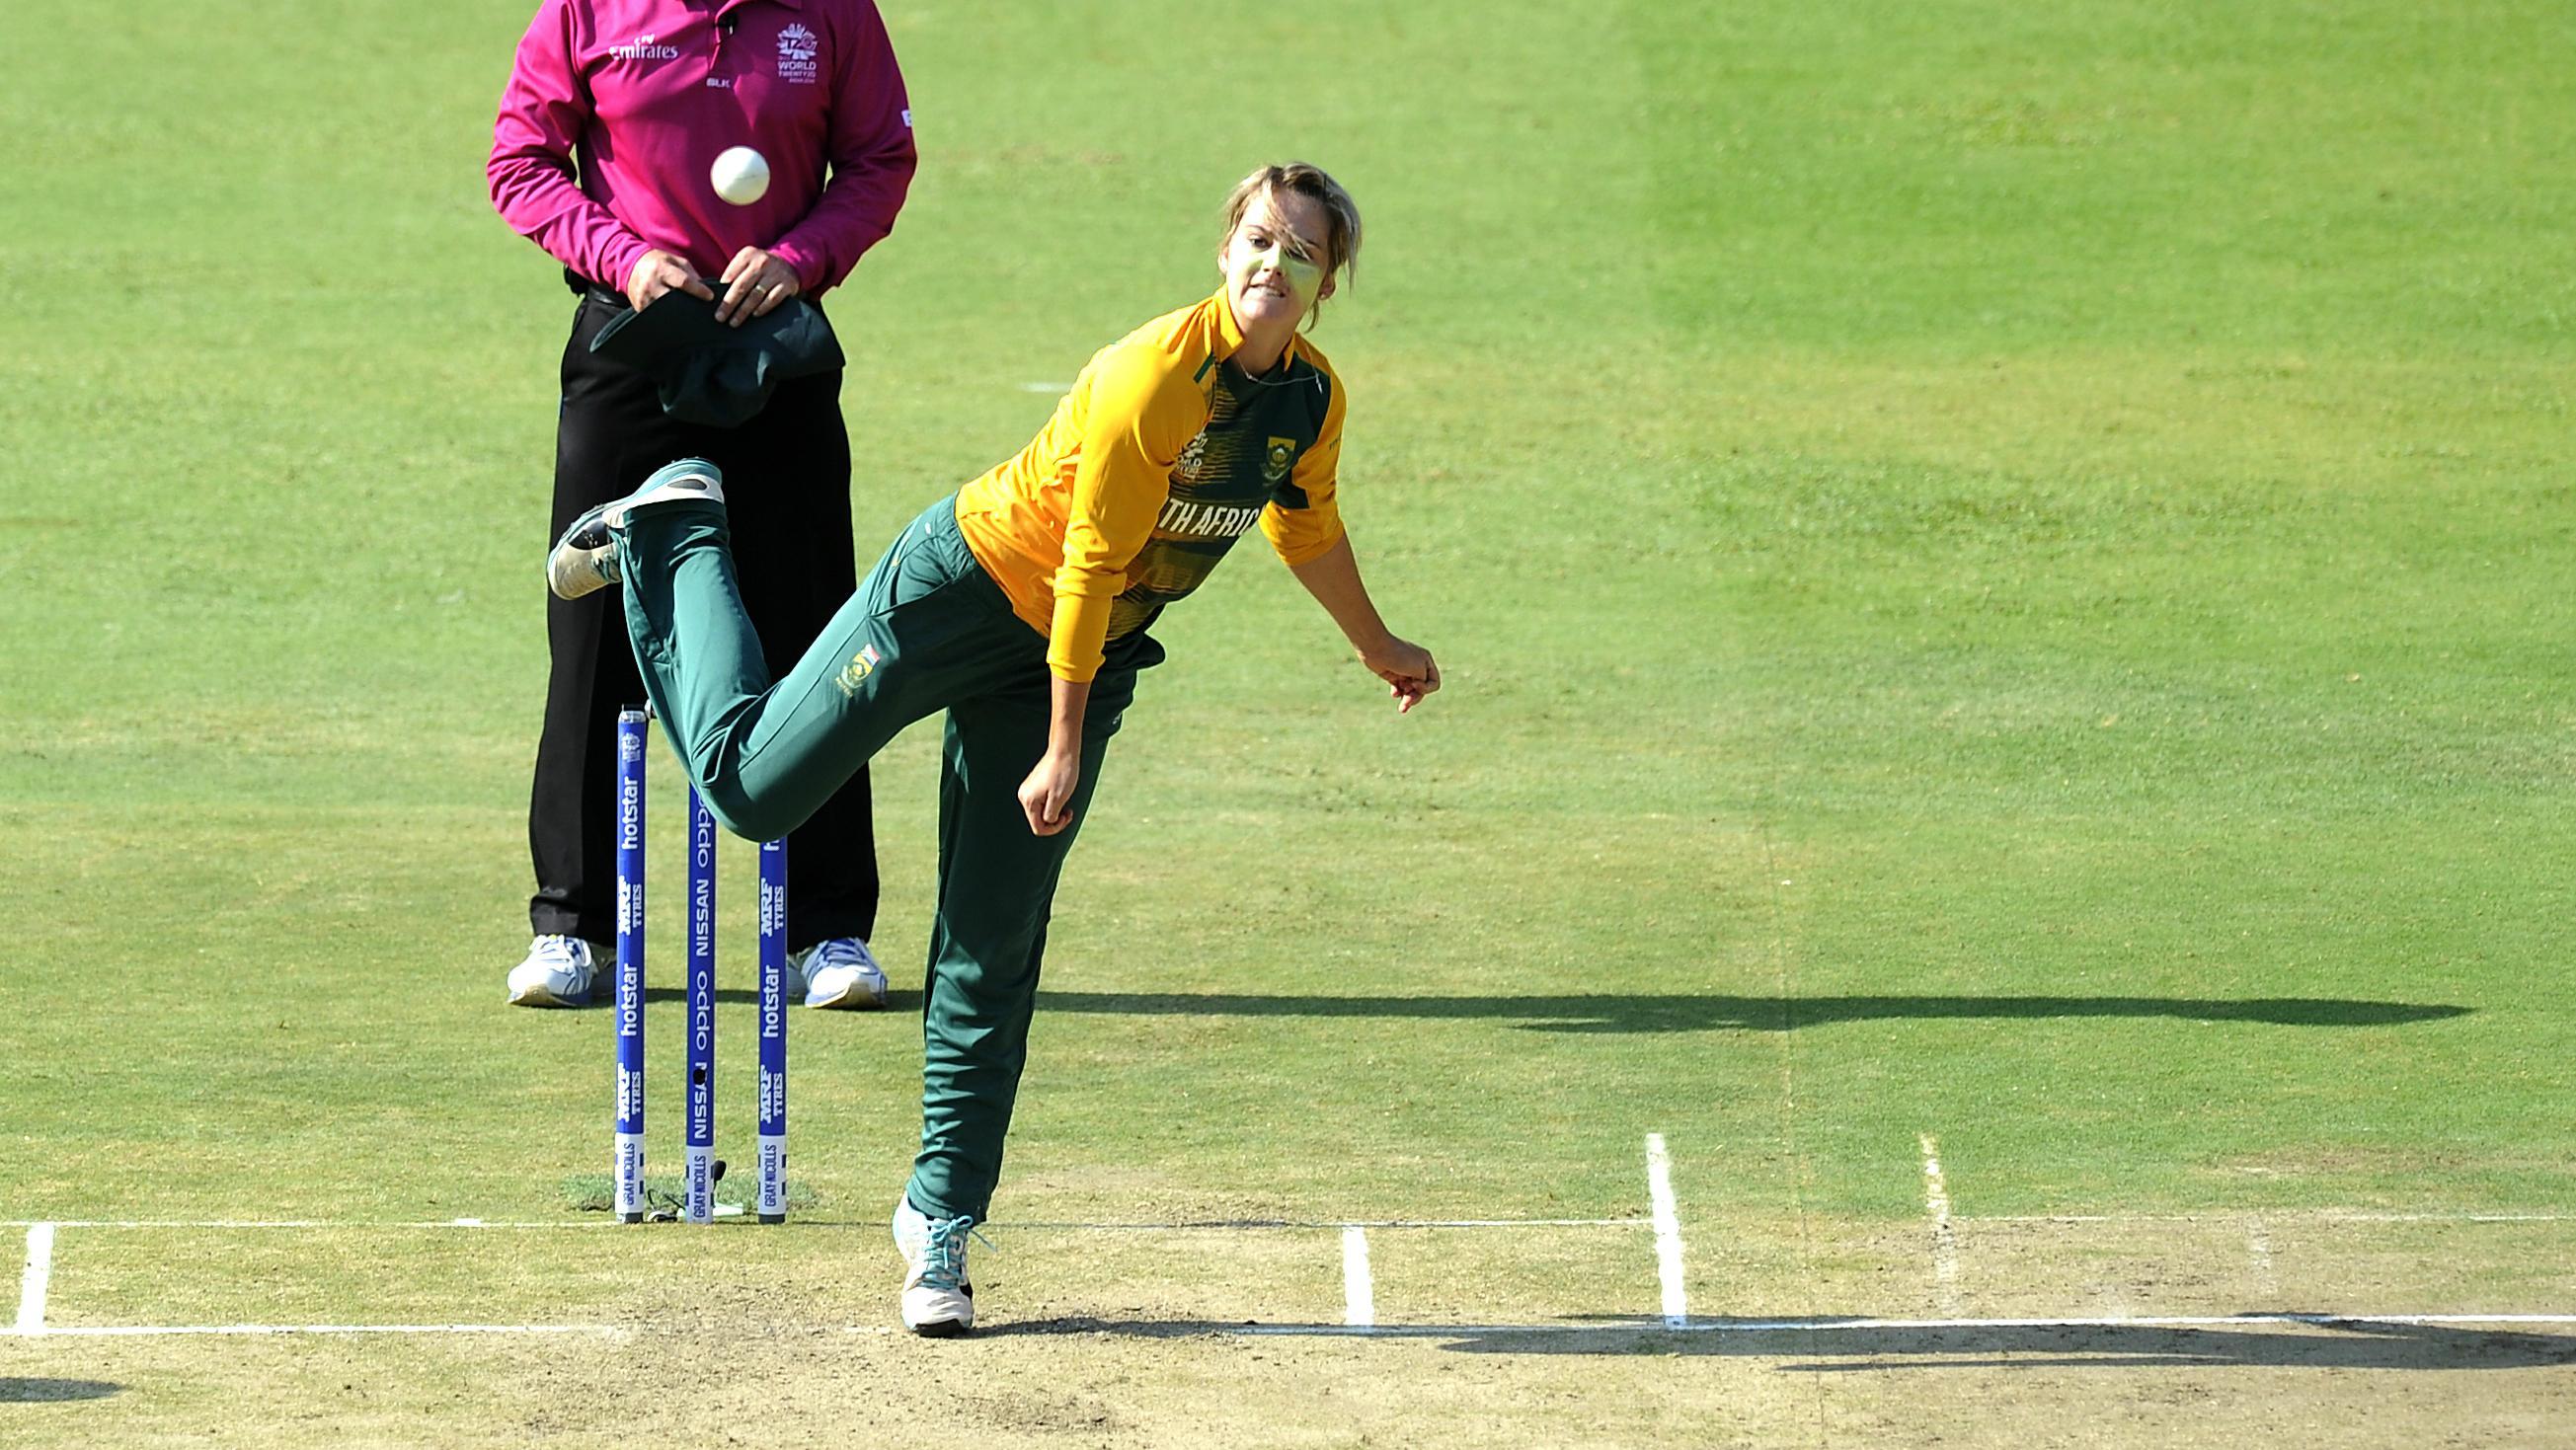 Cricket Scores Highlights News Fixtures Sky Sports | Autos ...